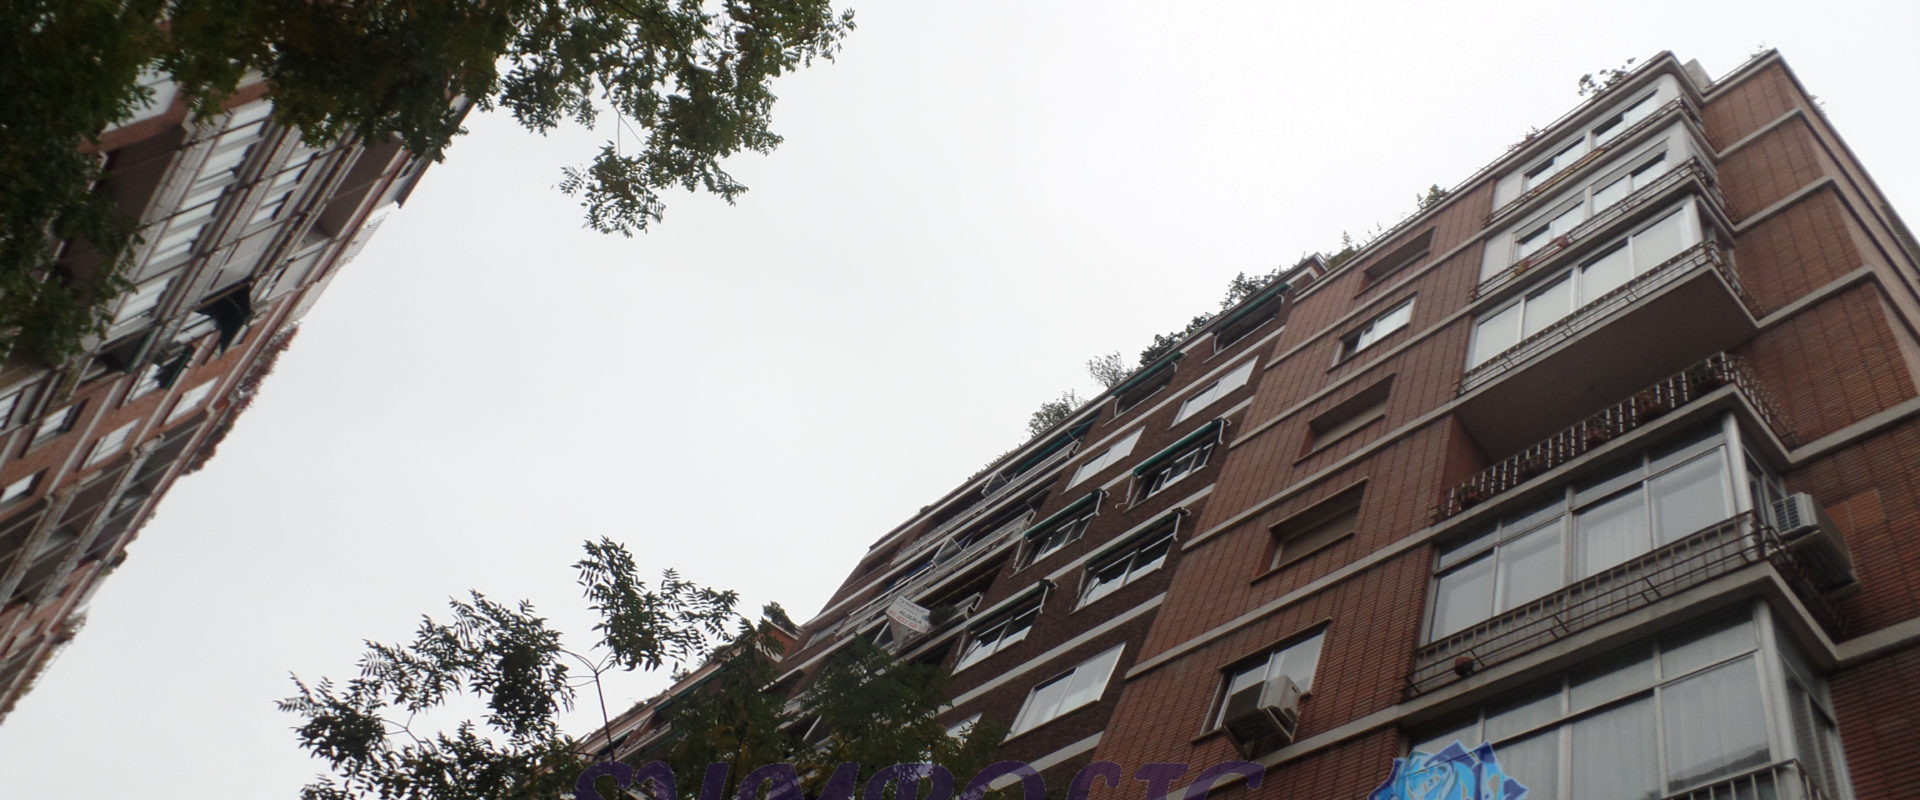 Chamberí-Vallehermoso